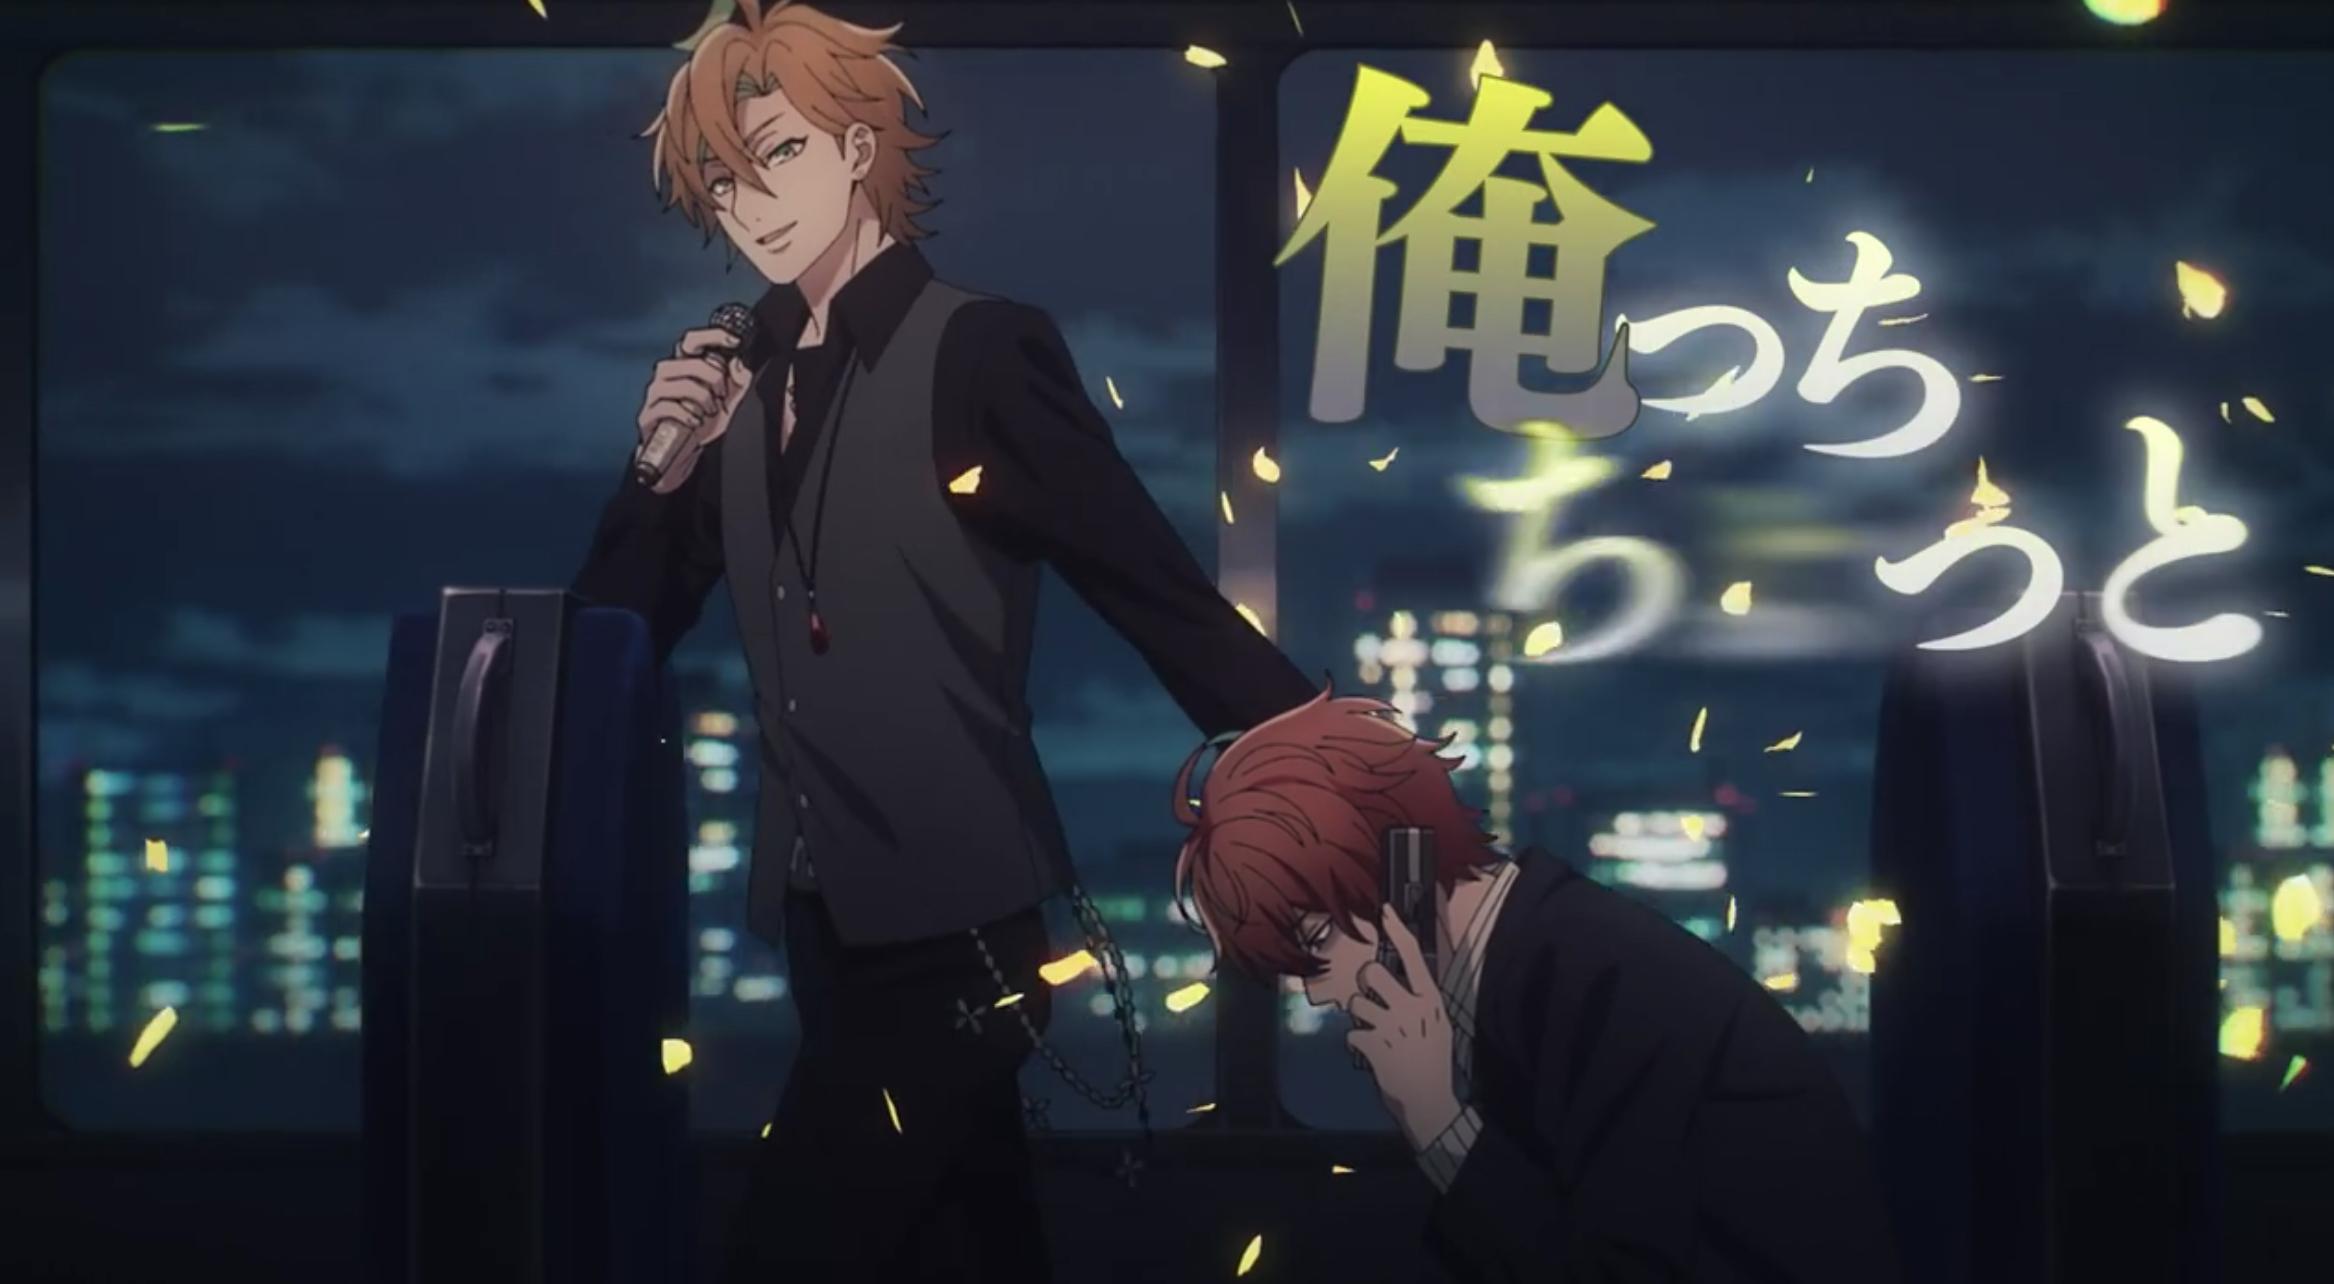 TVアニメ「ヒプマイ」7話感想 独歩に一二三以外の友達が!?シンジュクでは連続強盗事件が発生